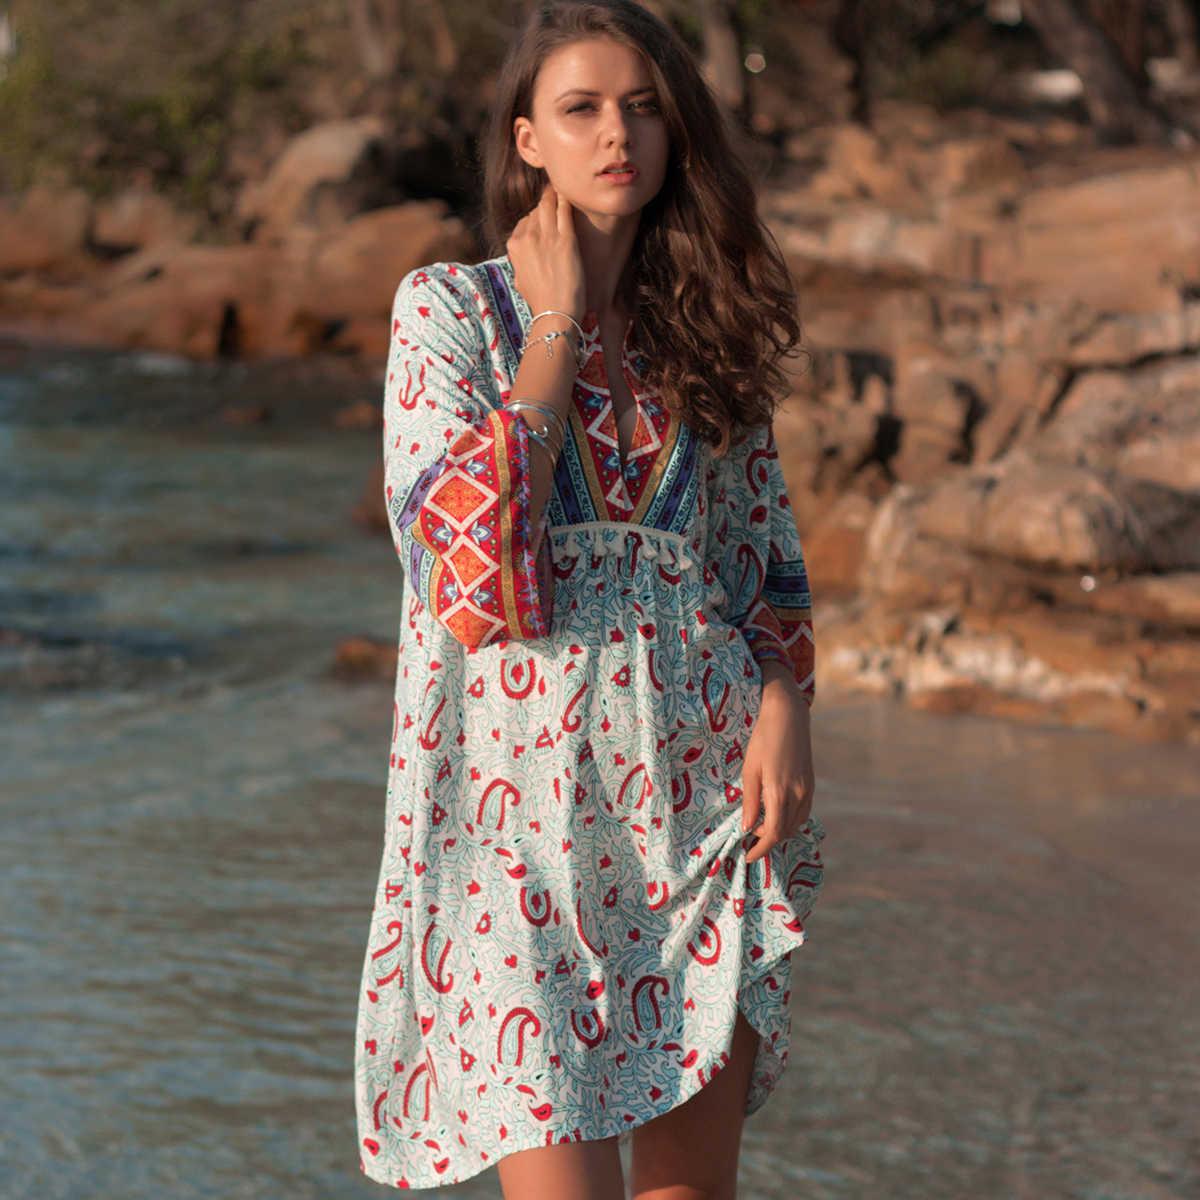 38a7c25777 Bohemian Print Mini Dress Women Causal 2019 Summer Long Sleeve Vneck Sexy Dress  Ladies Boho Loose